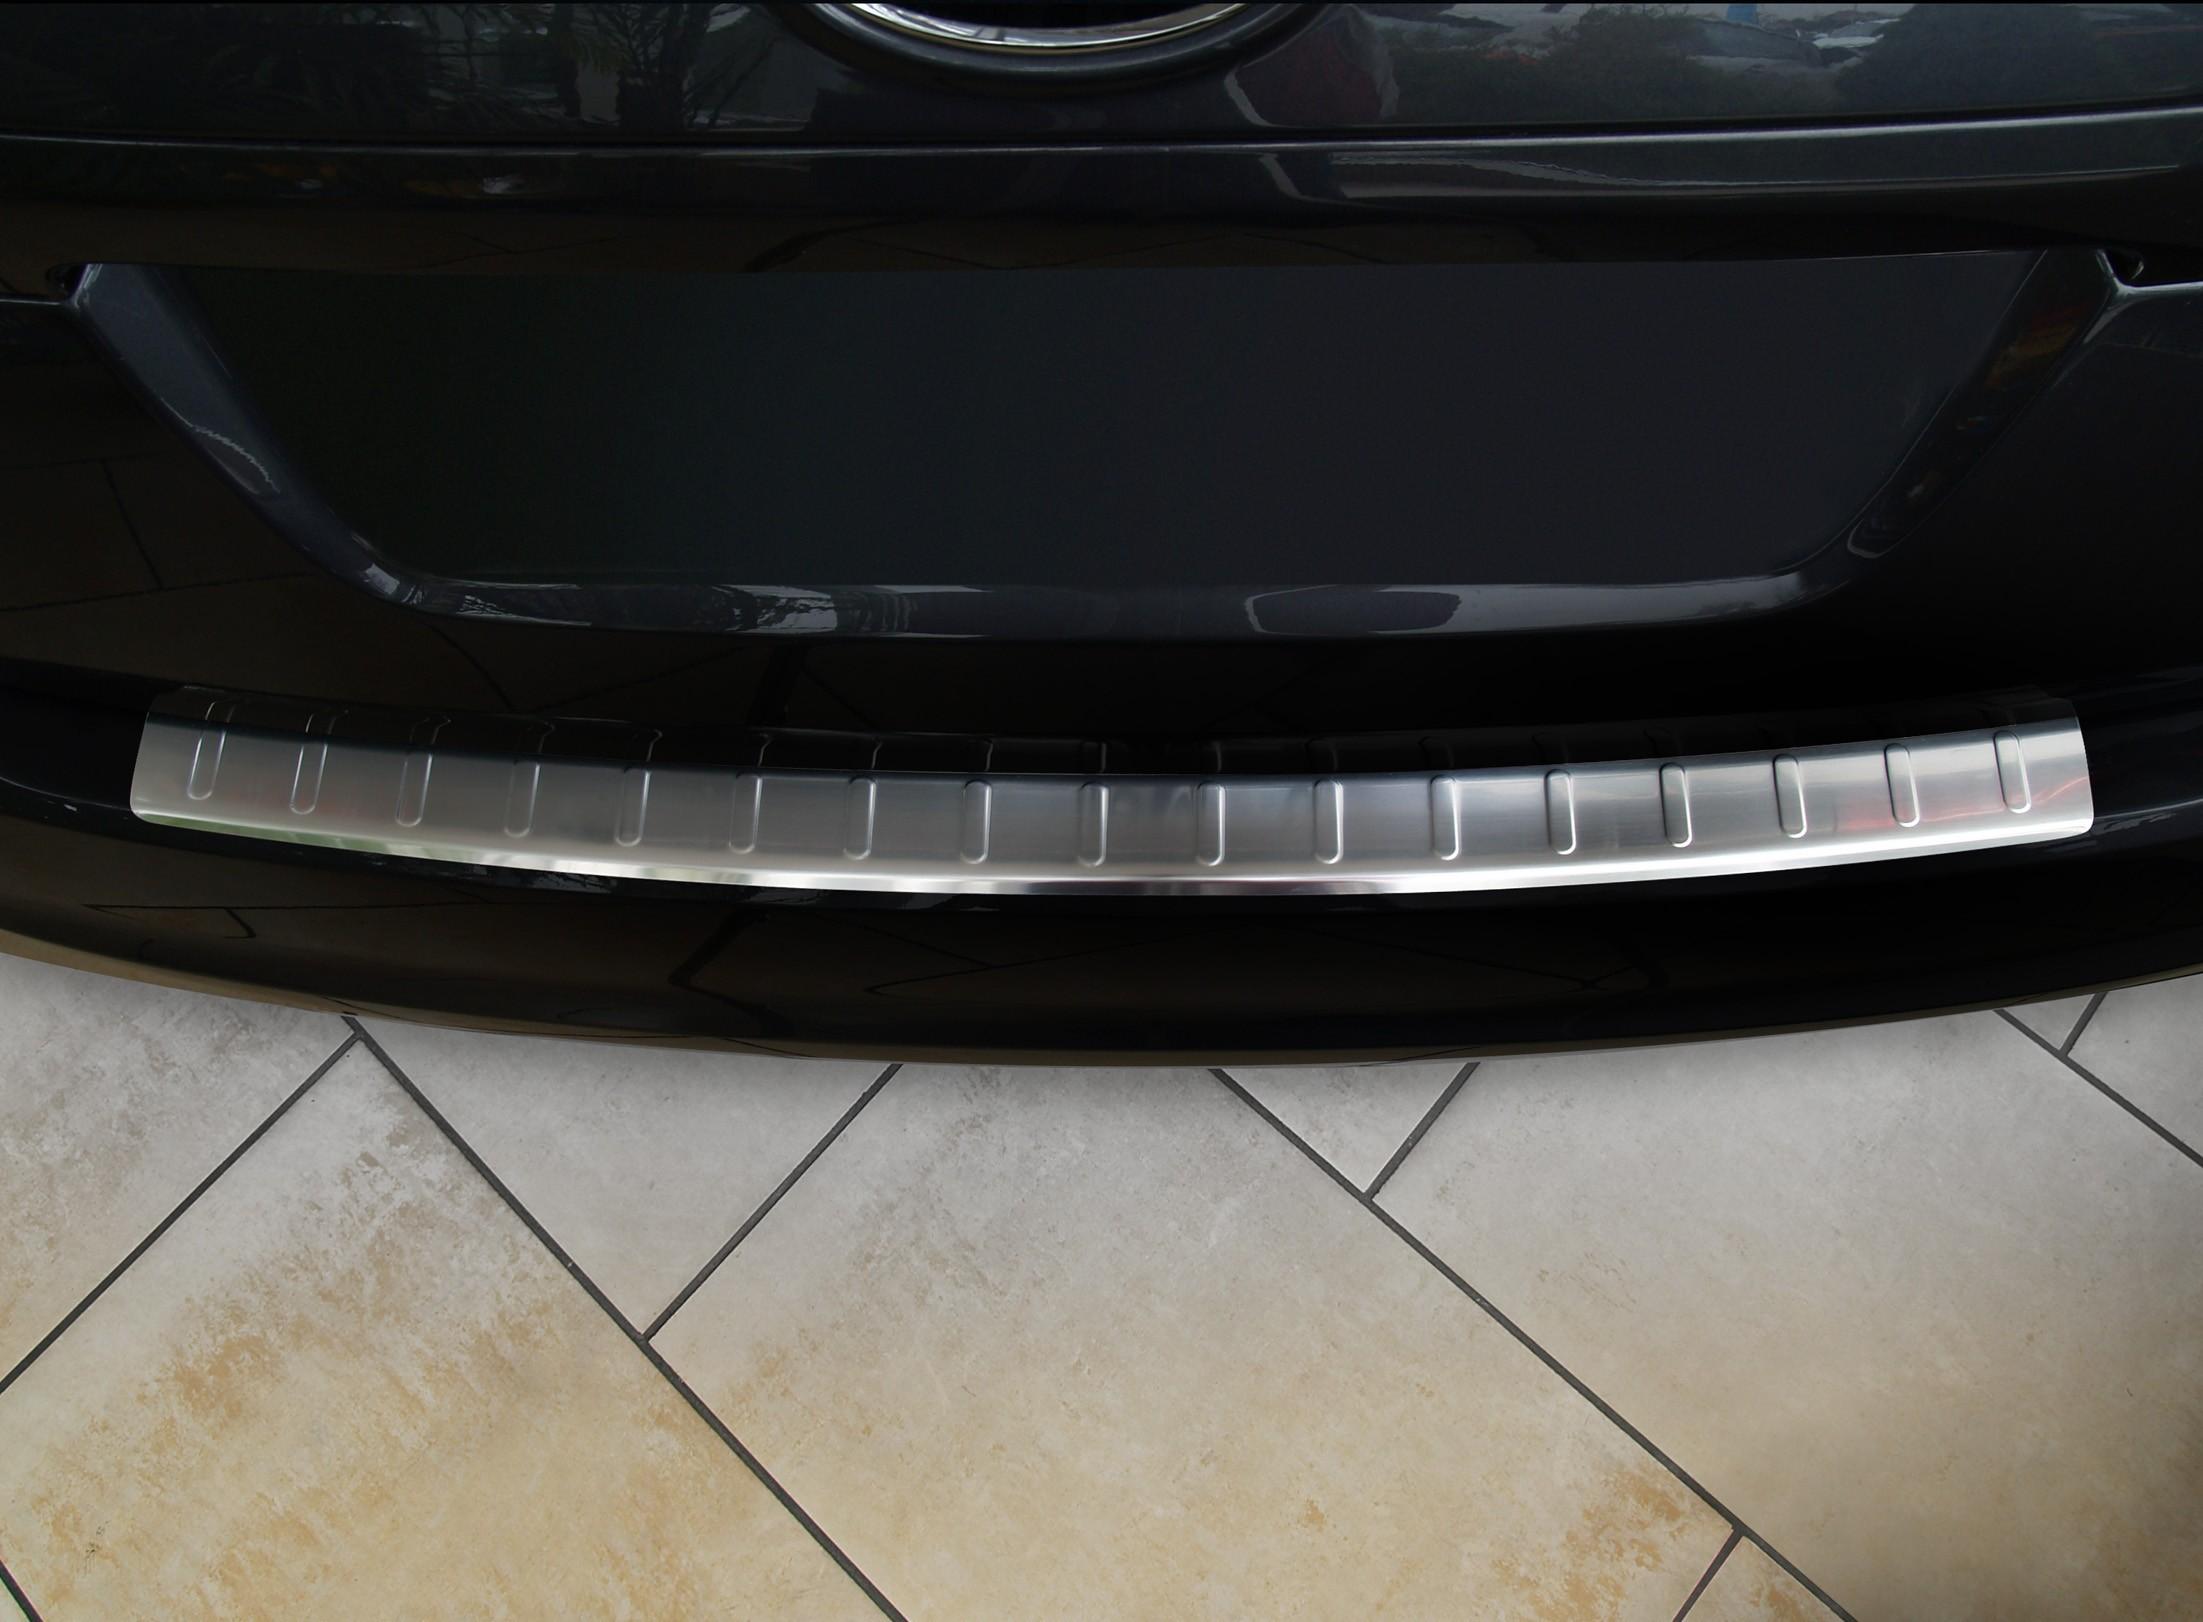 KIA VENGA 5d hatchback Profiled ribs 2009-